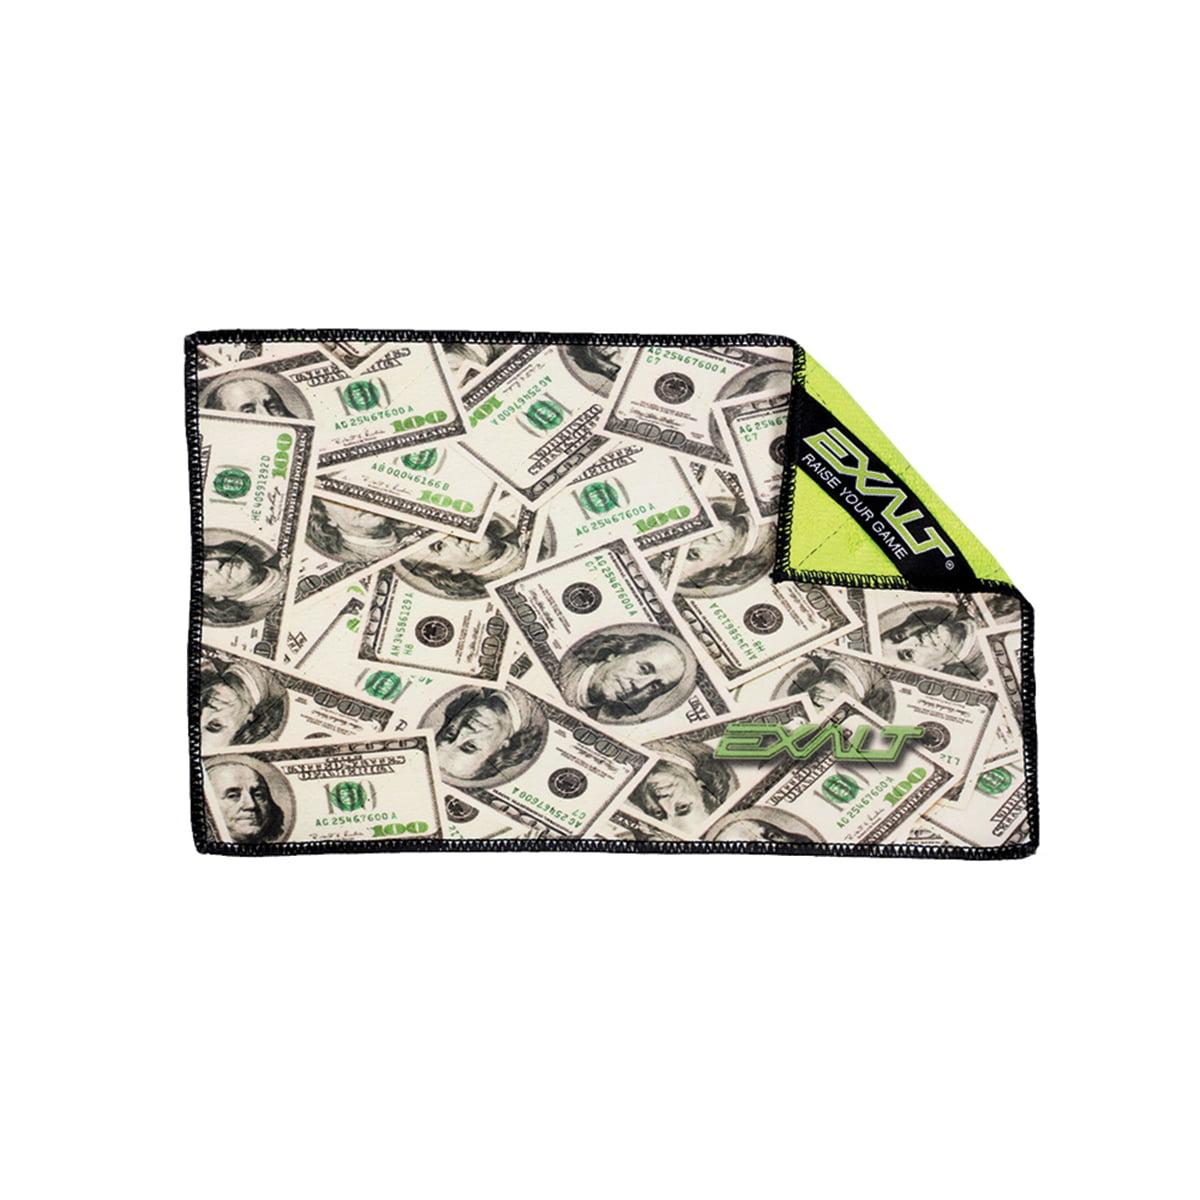 Exalt Paintball Microfiber Goggle Cloth Player Size Cash Money by Exalt